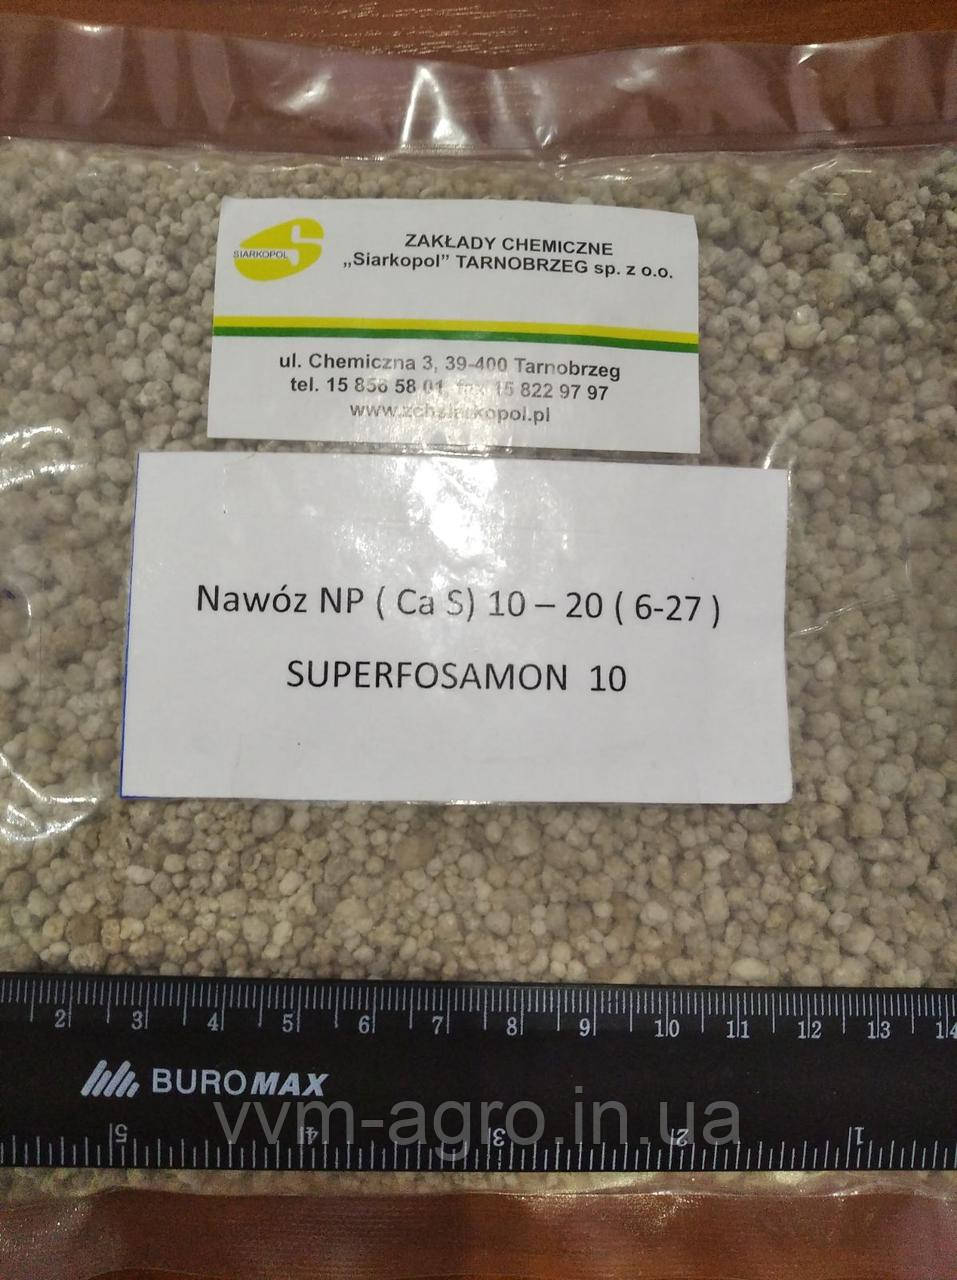 Суперфосфат амонізований Superfosamon 10 NPS(Ca) 10-20-27 (6)